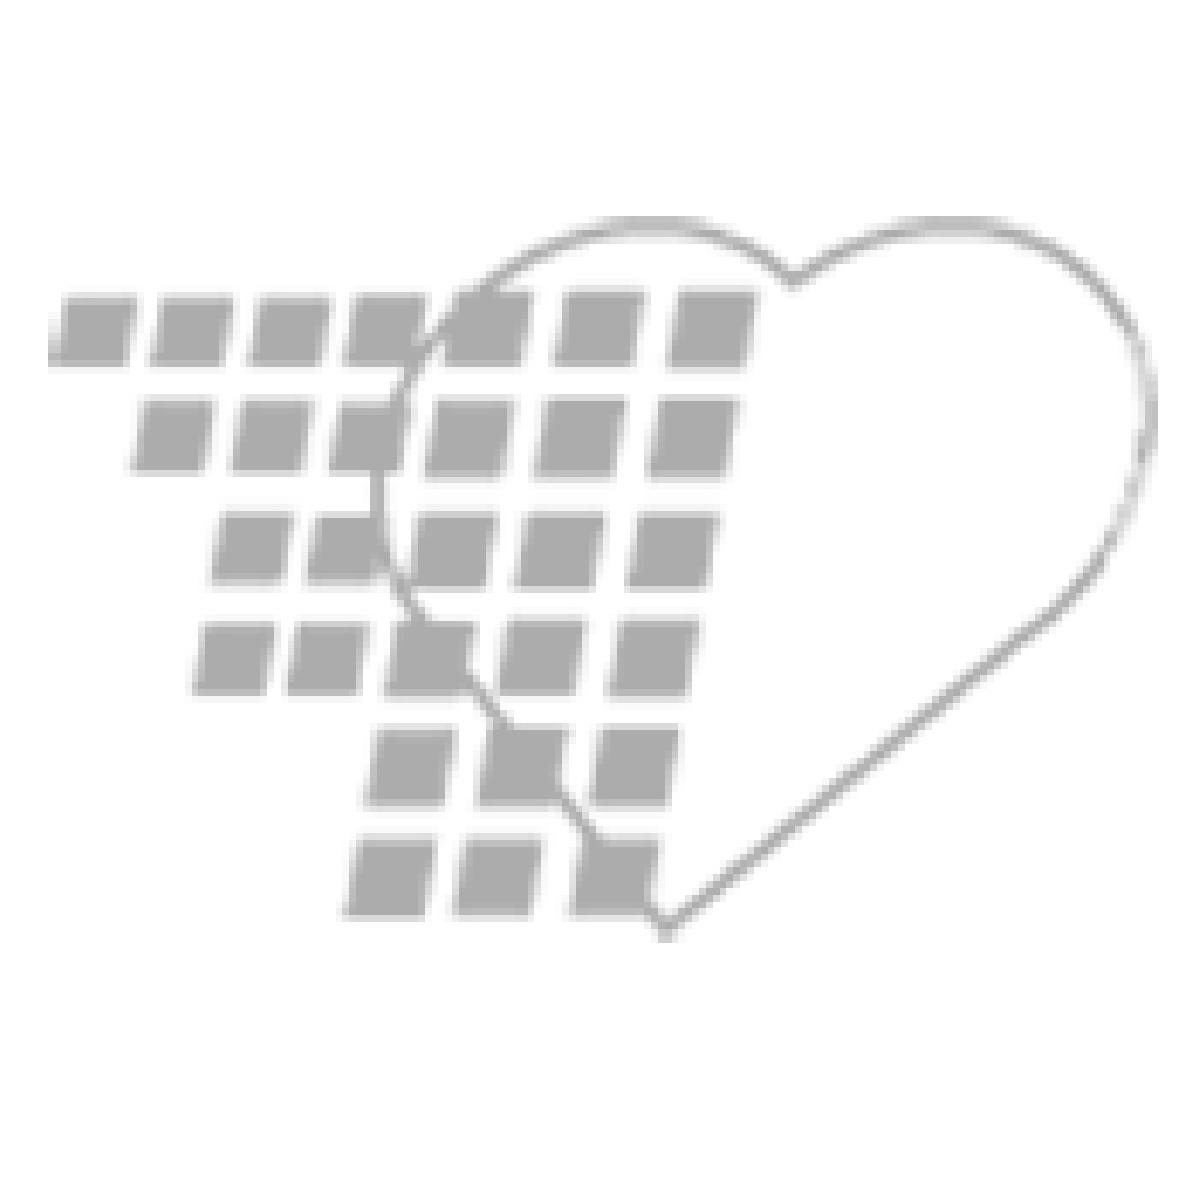 02-38-5500 Medline Monofilament Foot Screen Test